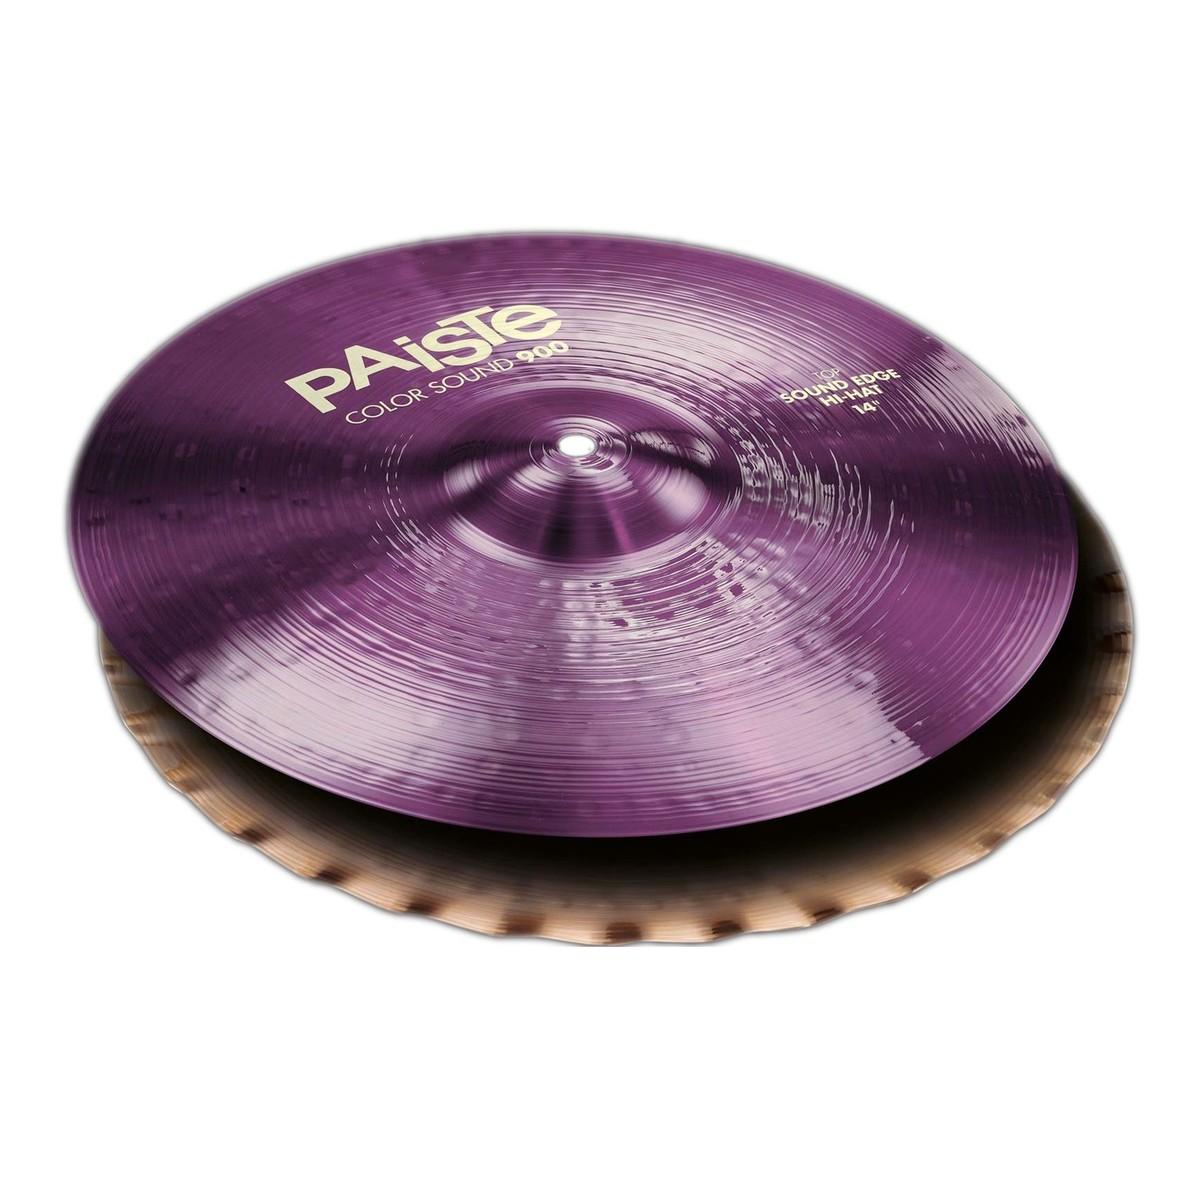 paiste color sound 900 purple 14 loading zoom